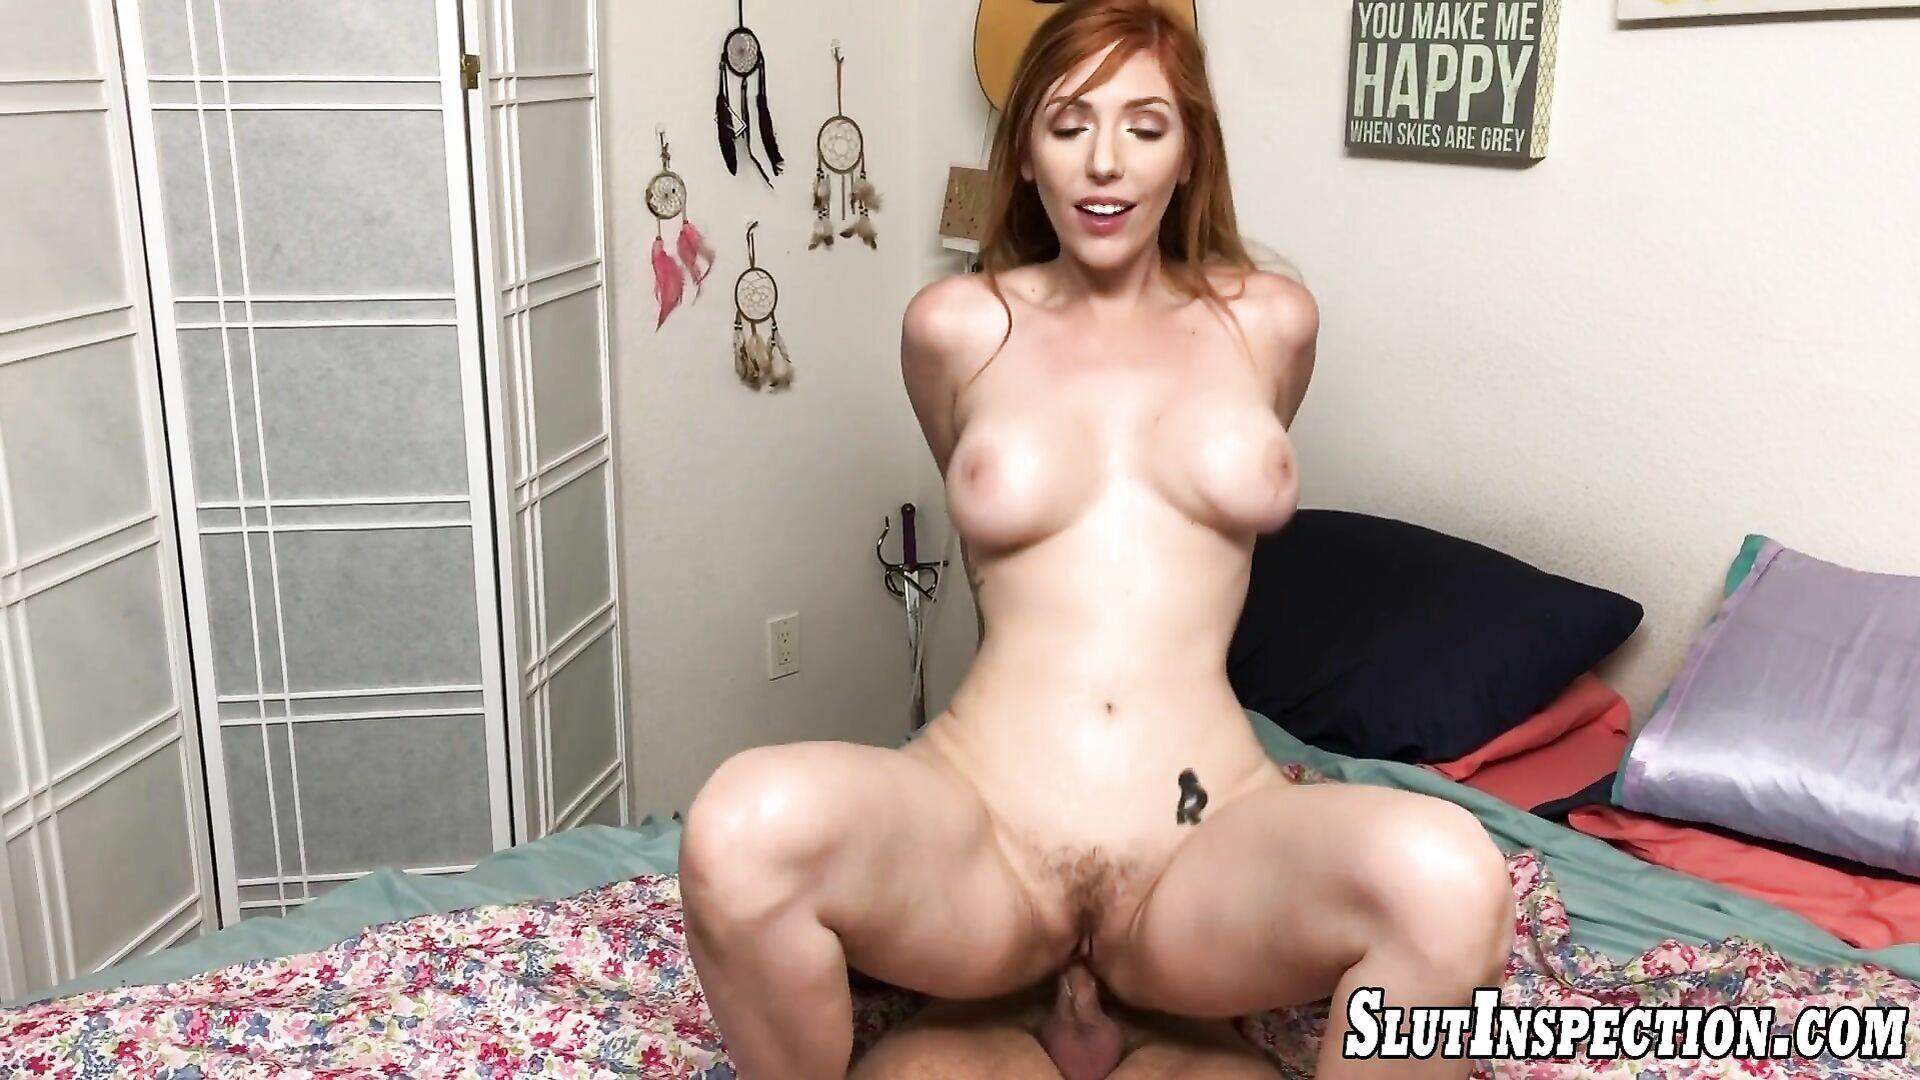 SlutInspection